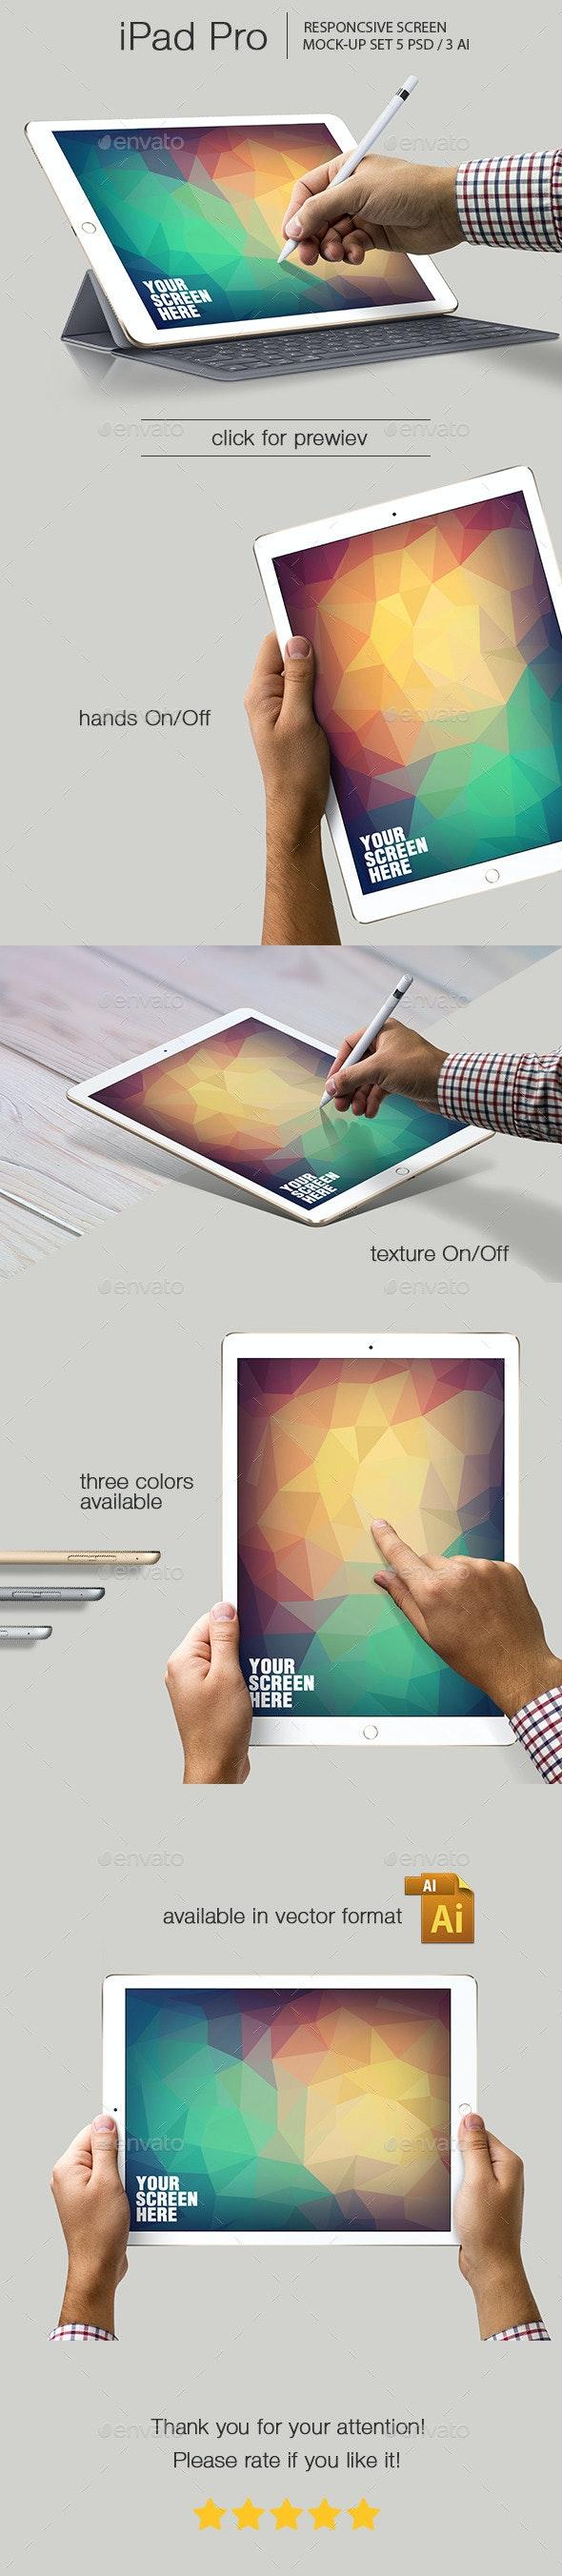 iPad Pro Responsive Mockup - Mobile Displays